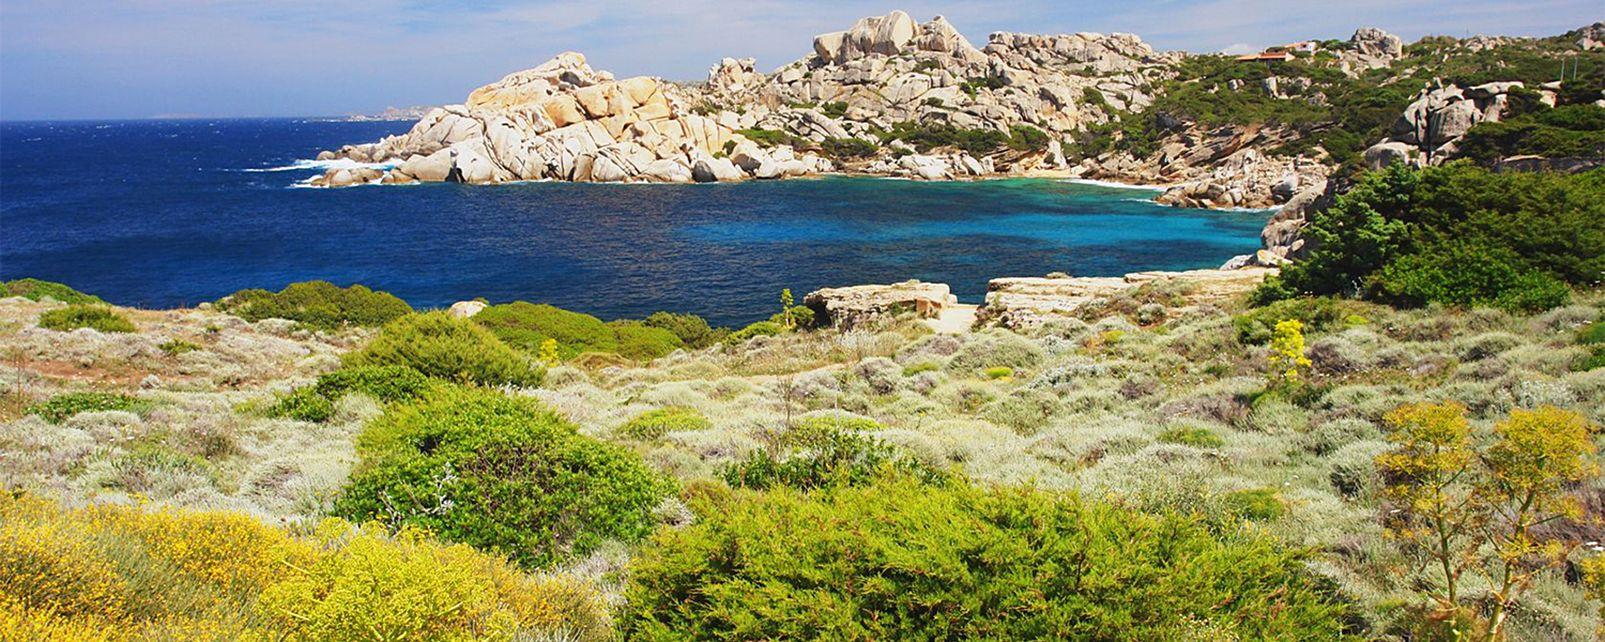 Le Capo Testa , Blick auf Korsika vom Capo Testa , Italien